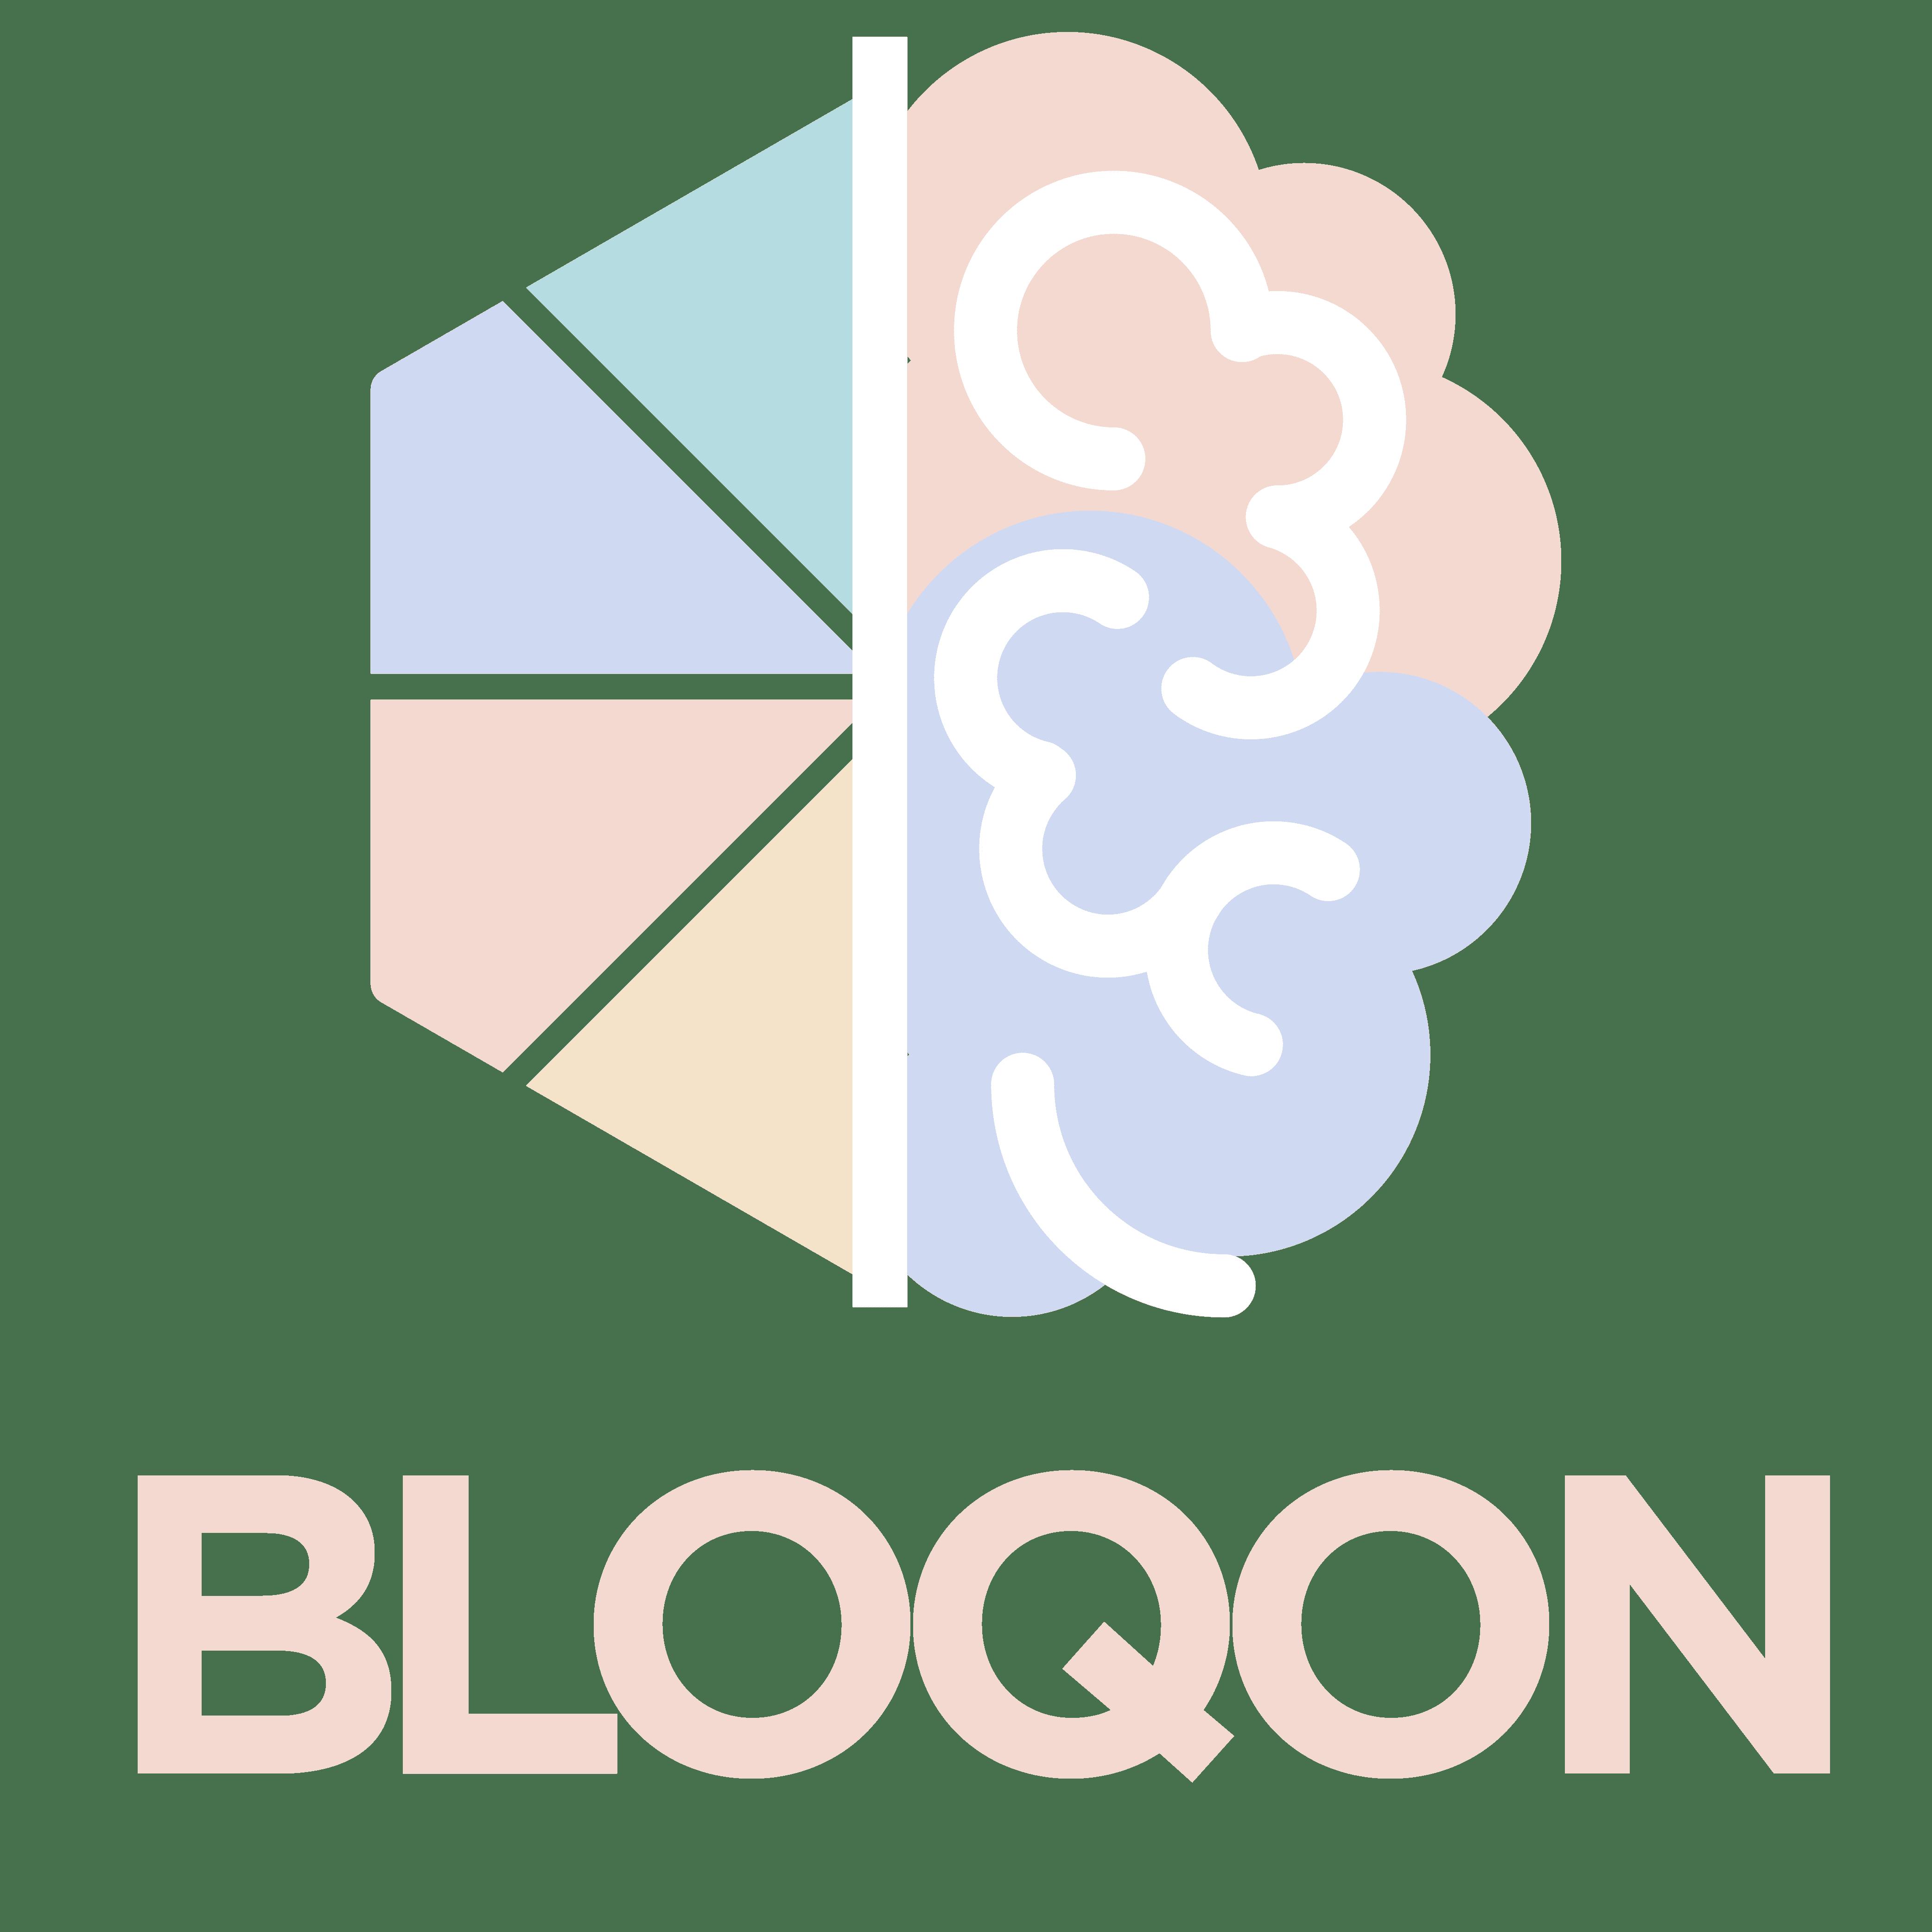 Bloqon